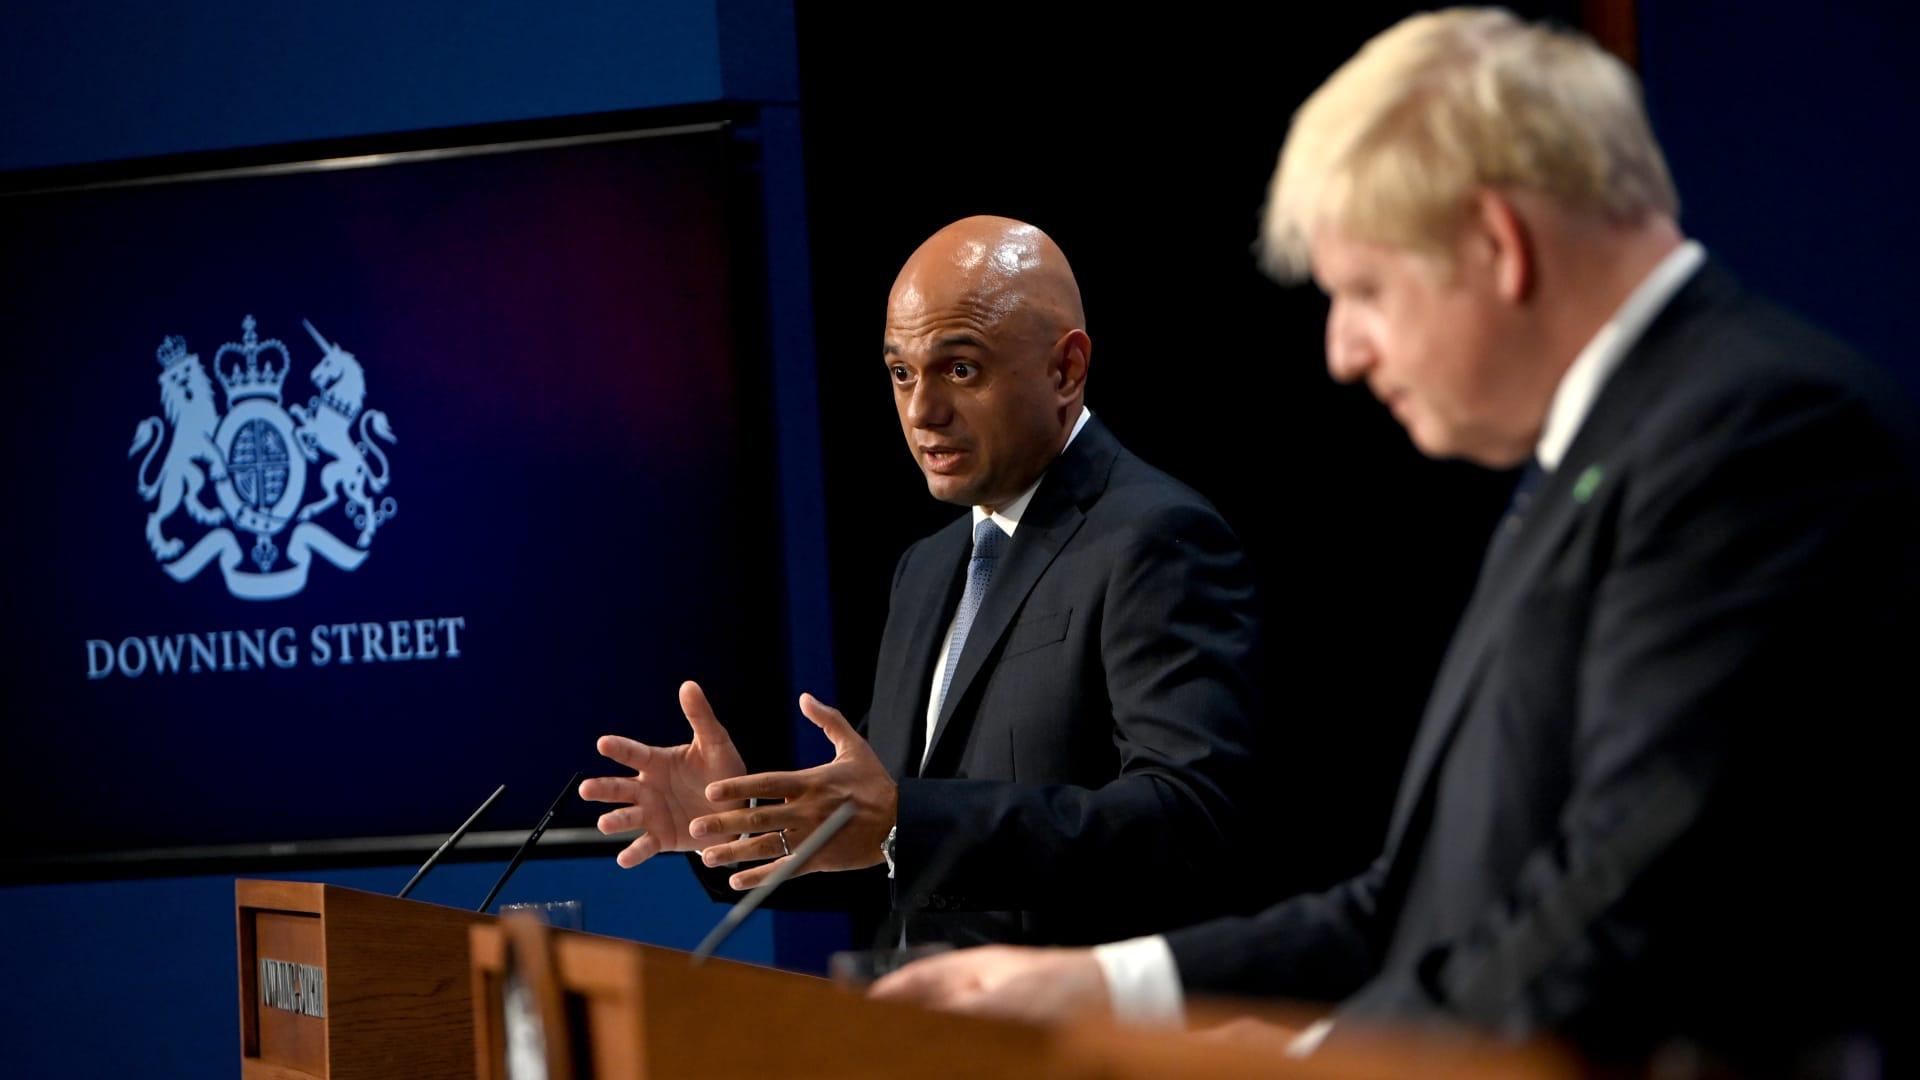 Sajid Javid, U.K. health secretary, left, and Boris Johnson, U.K. prime minister, during a news conference inside number 10 Downing Street in London, U.K., on Tuesday, Sept. 7, 2021.